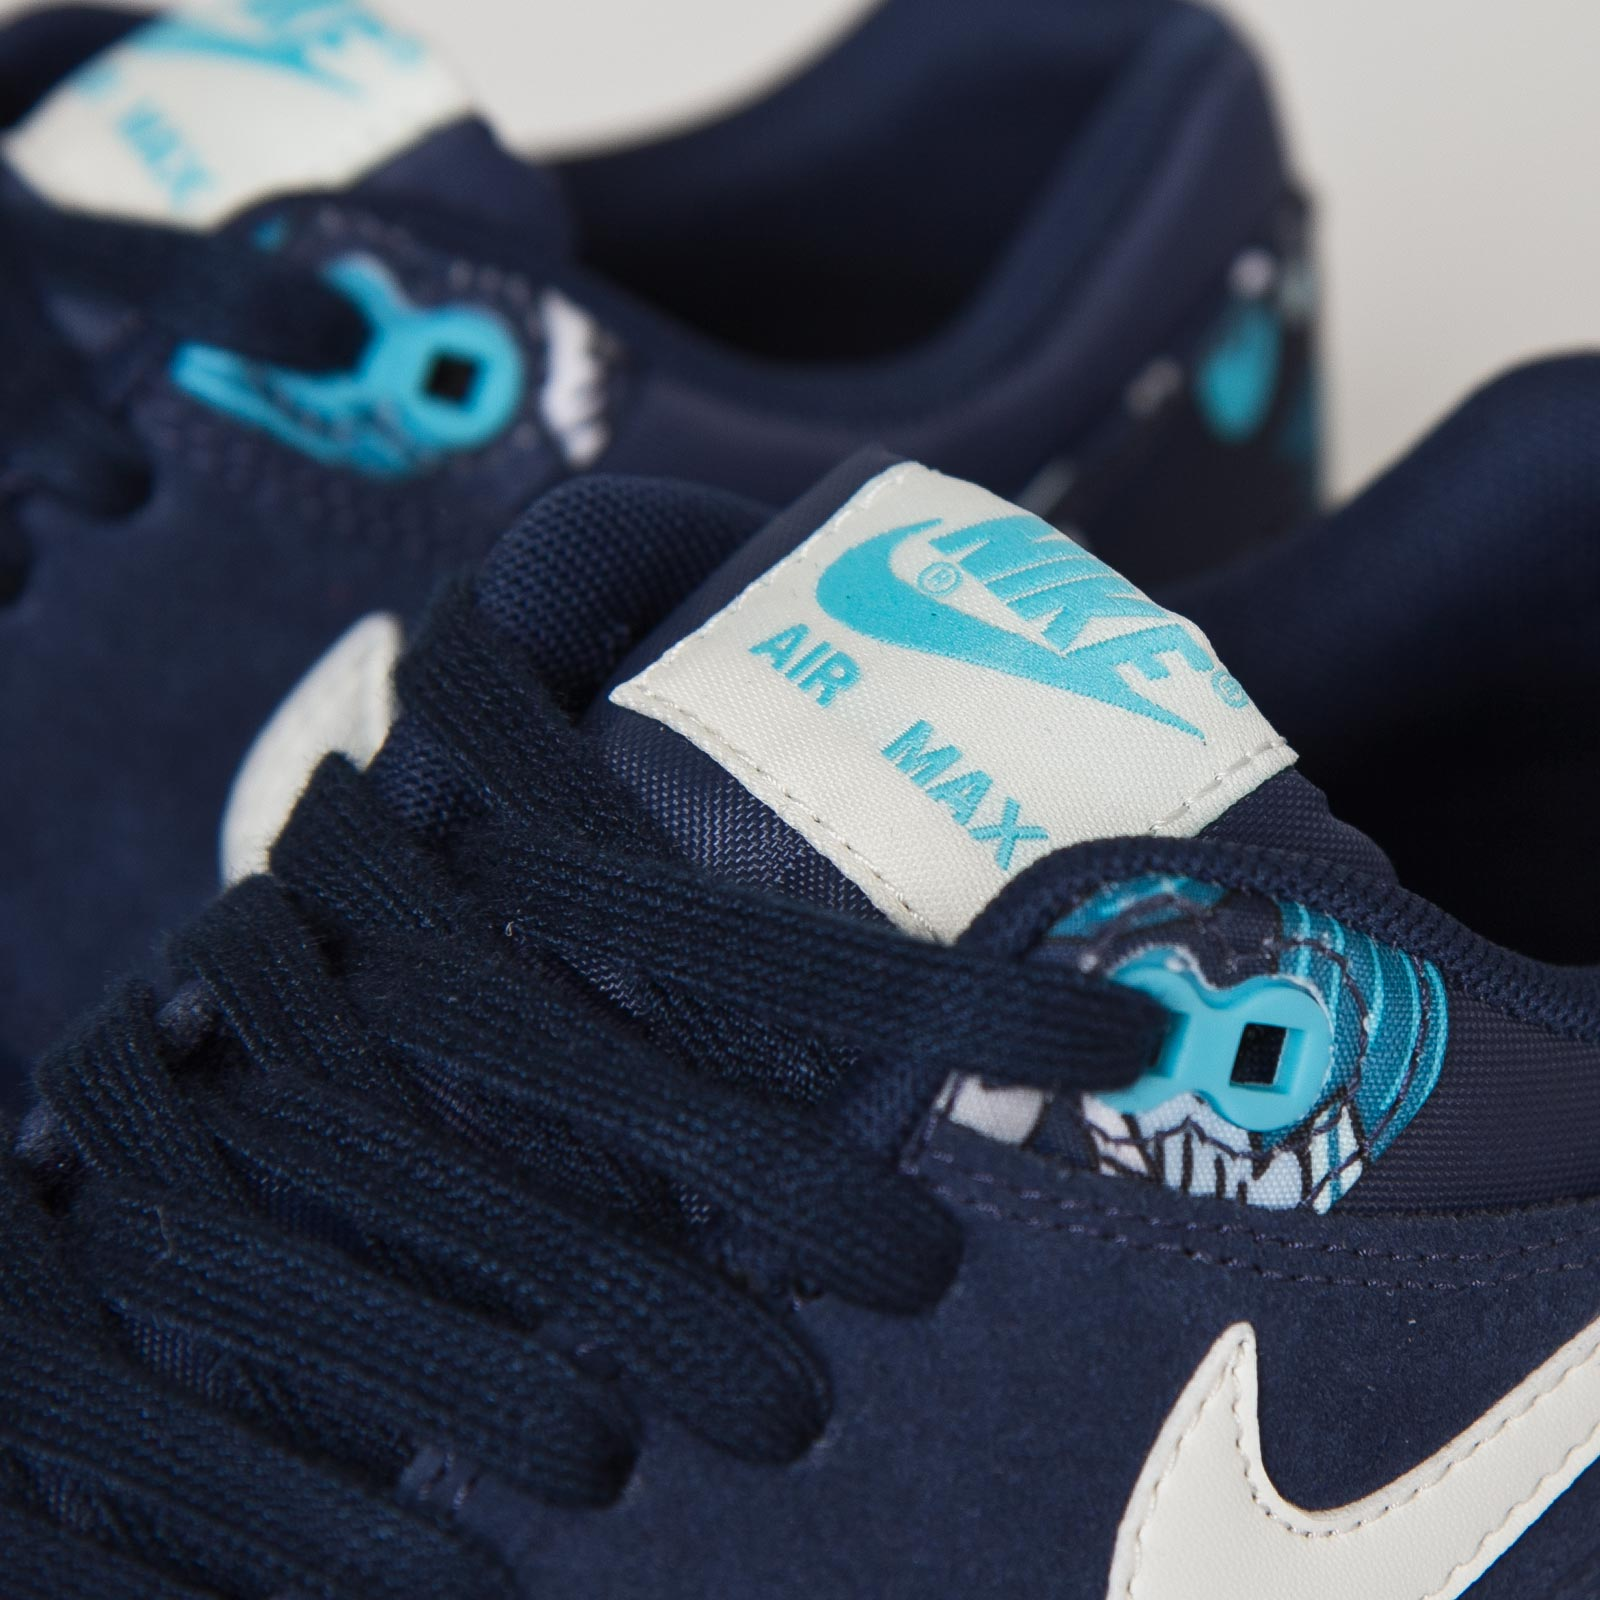 Nike Wmns Air Max 1 Print 528898 401 Sneakersnstuff